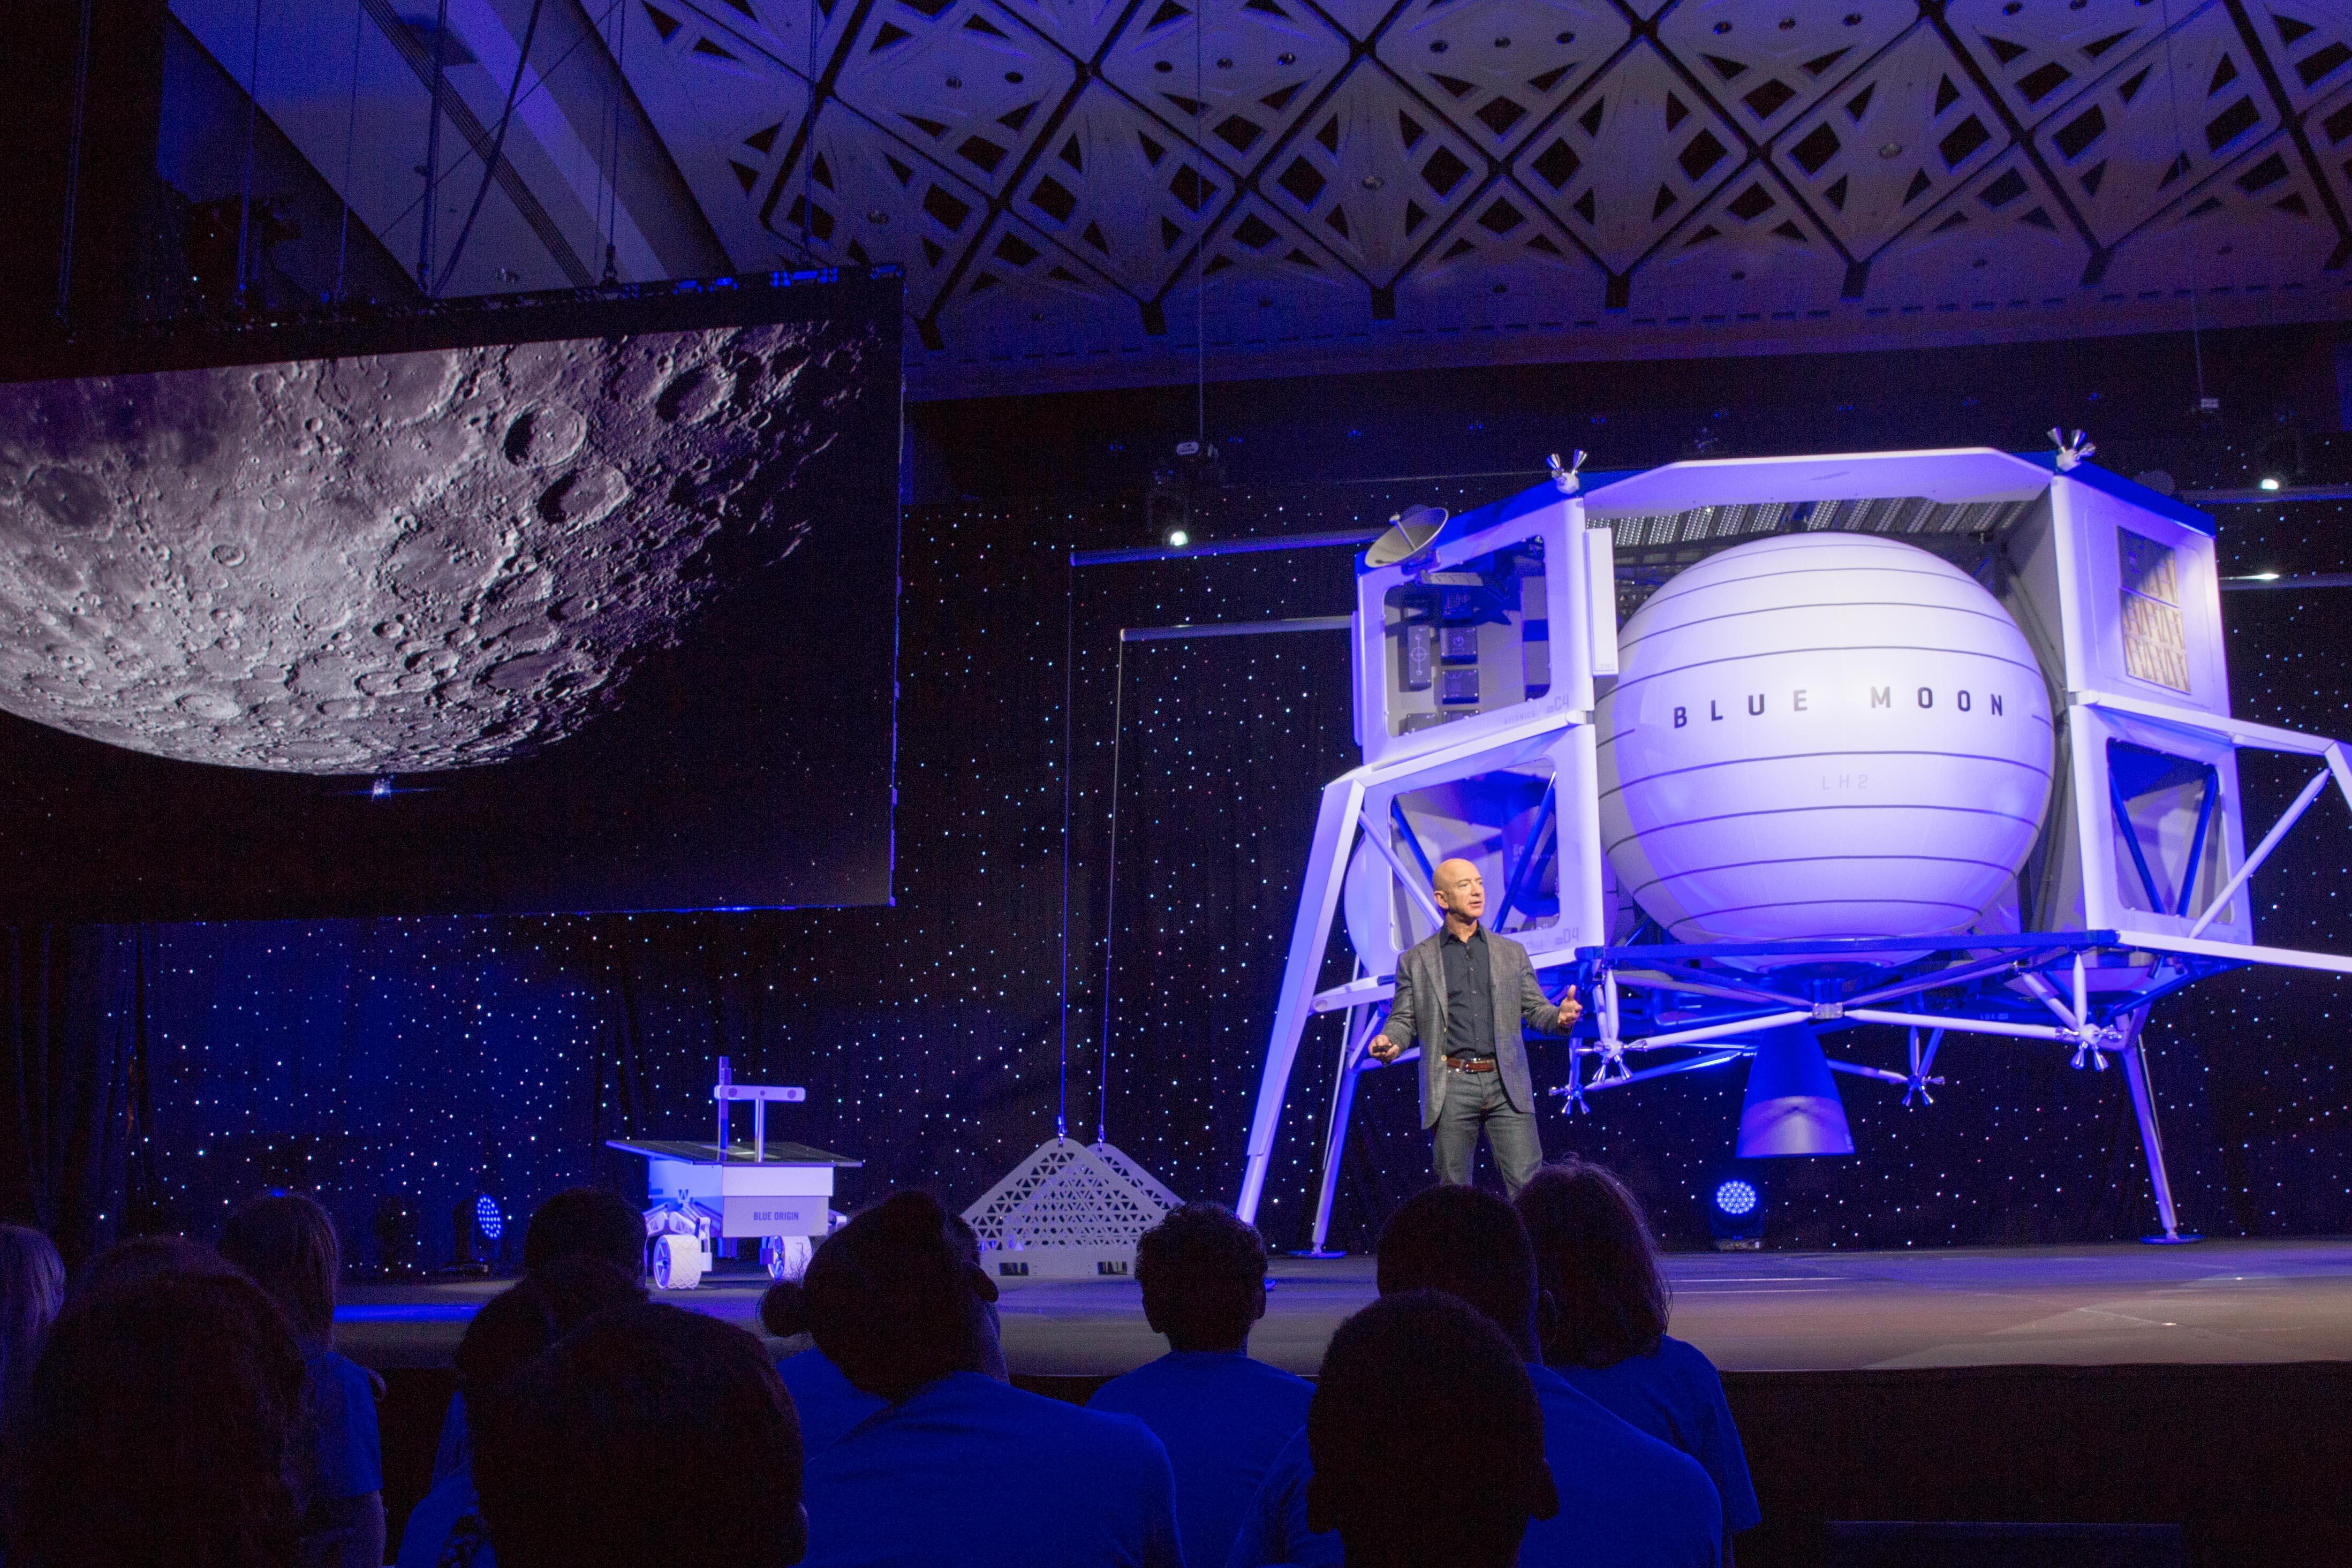 Jeff Bezos aims Blue Origin at the Moon   TechCrunch